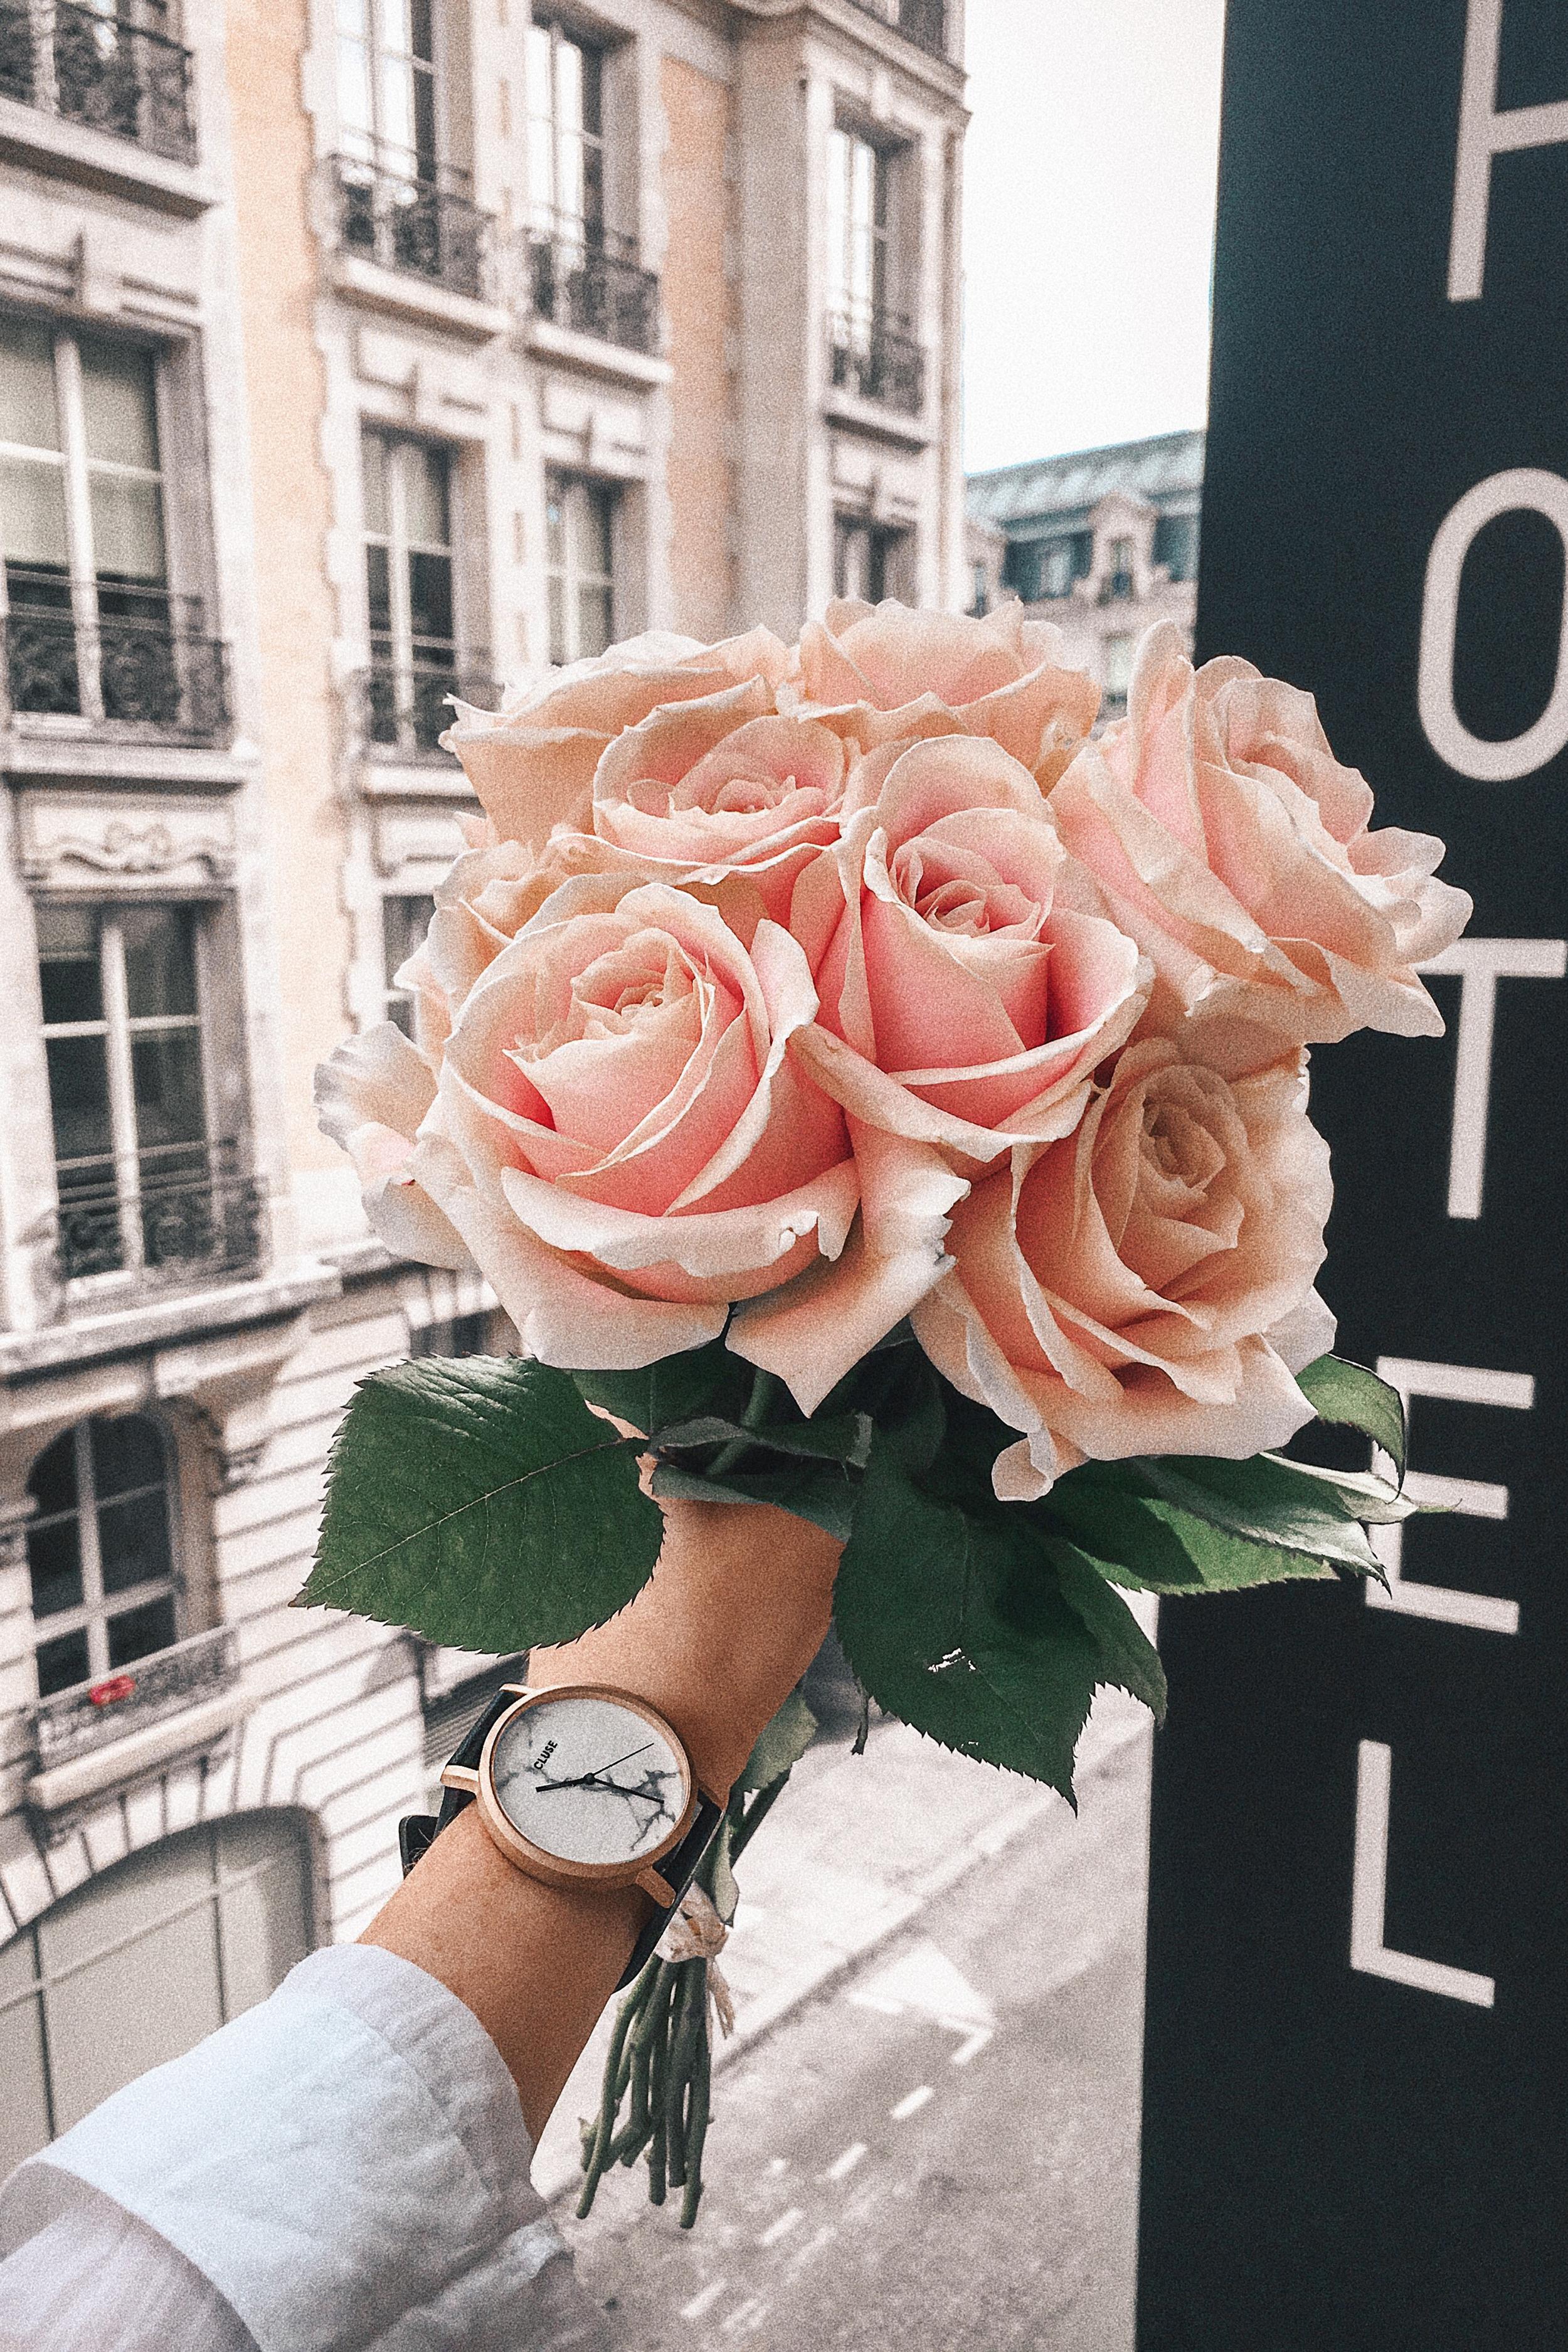 paris-hotel-balcony-romance-pink-roses_3.jpg